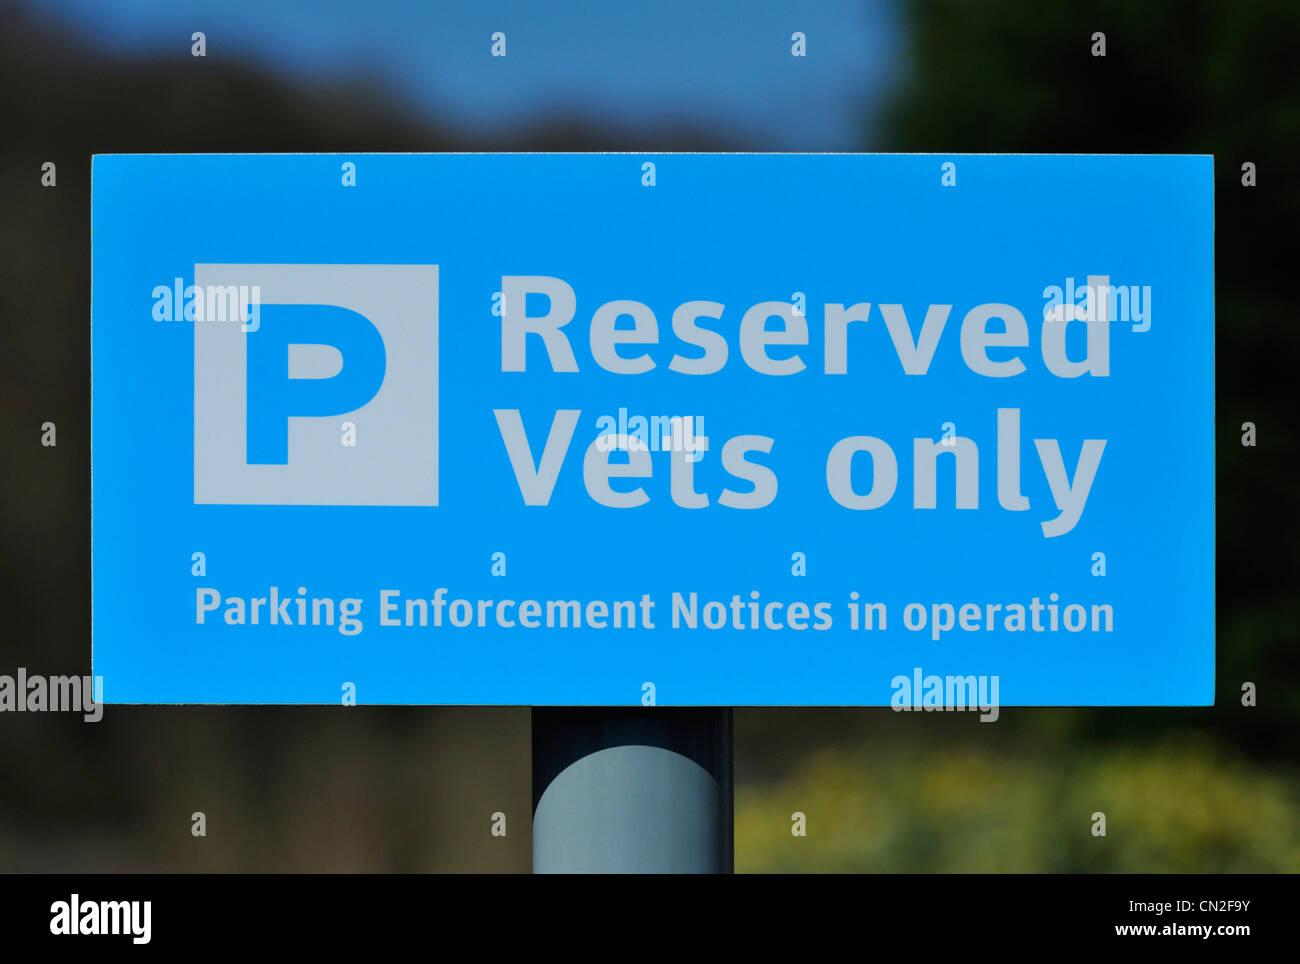 'Reserved Vets only'. Car parking notice at rail station. Grange-over-Sands, Cumbria, England, United Kingdom, - Stock Image